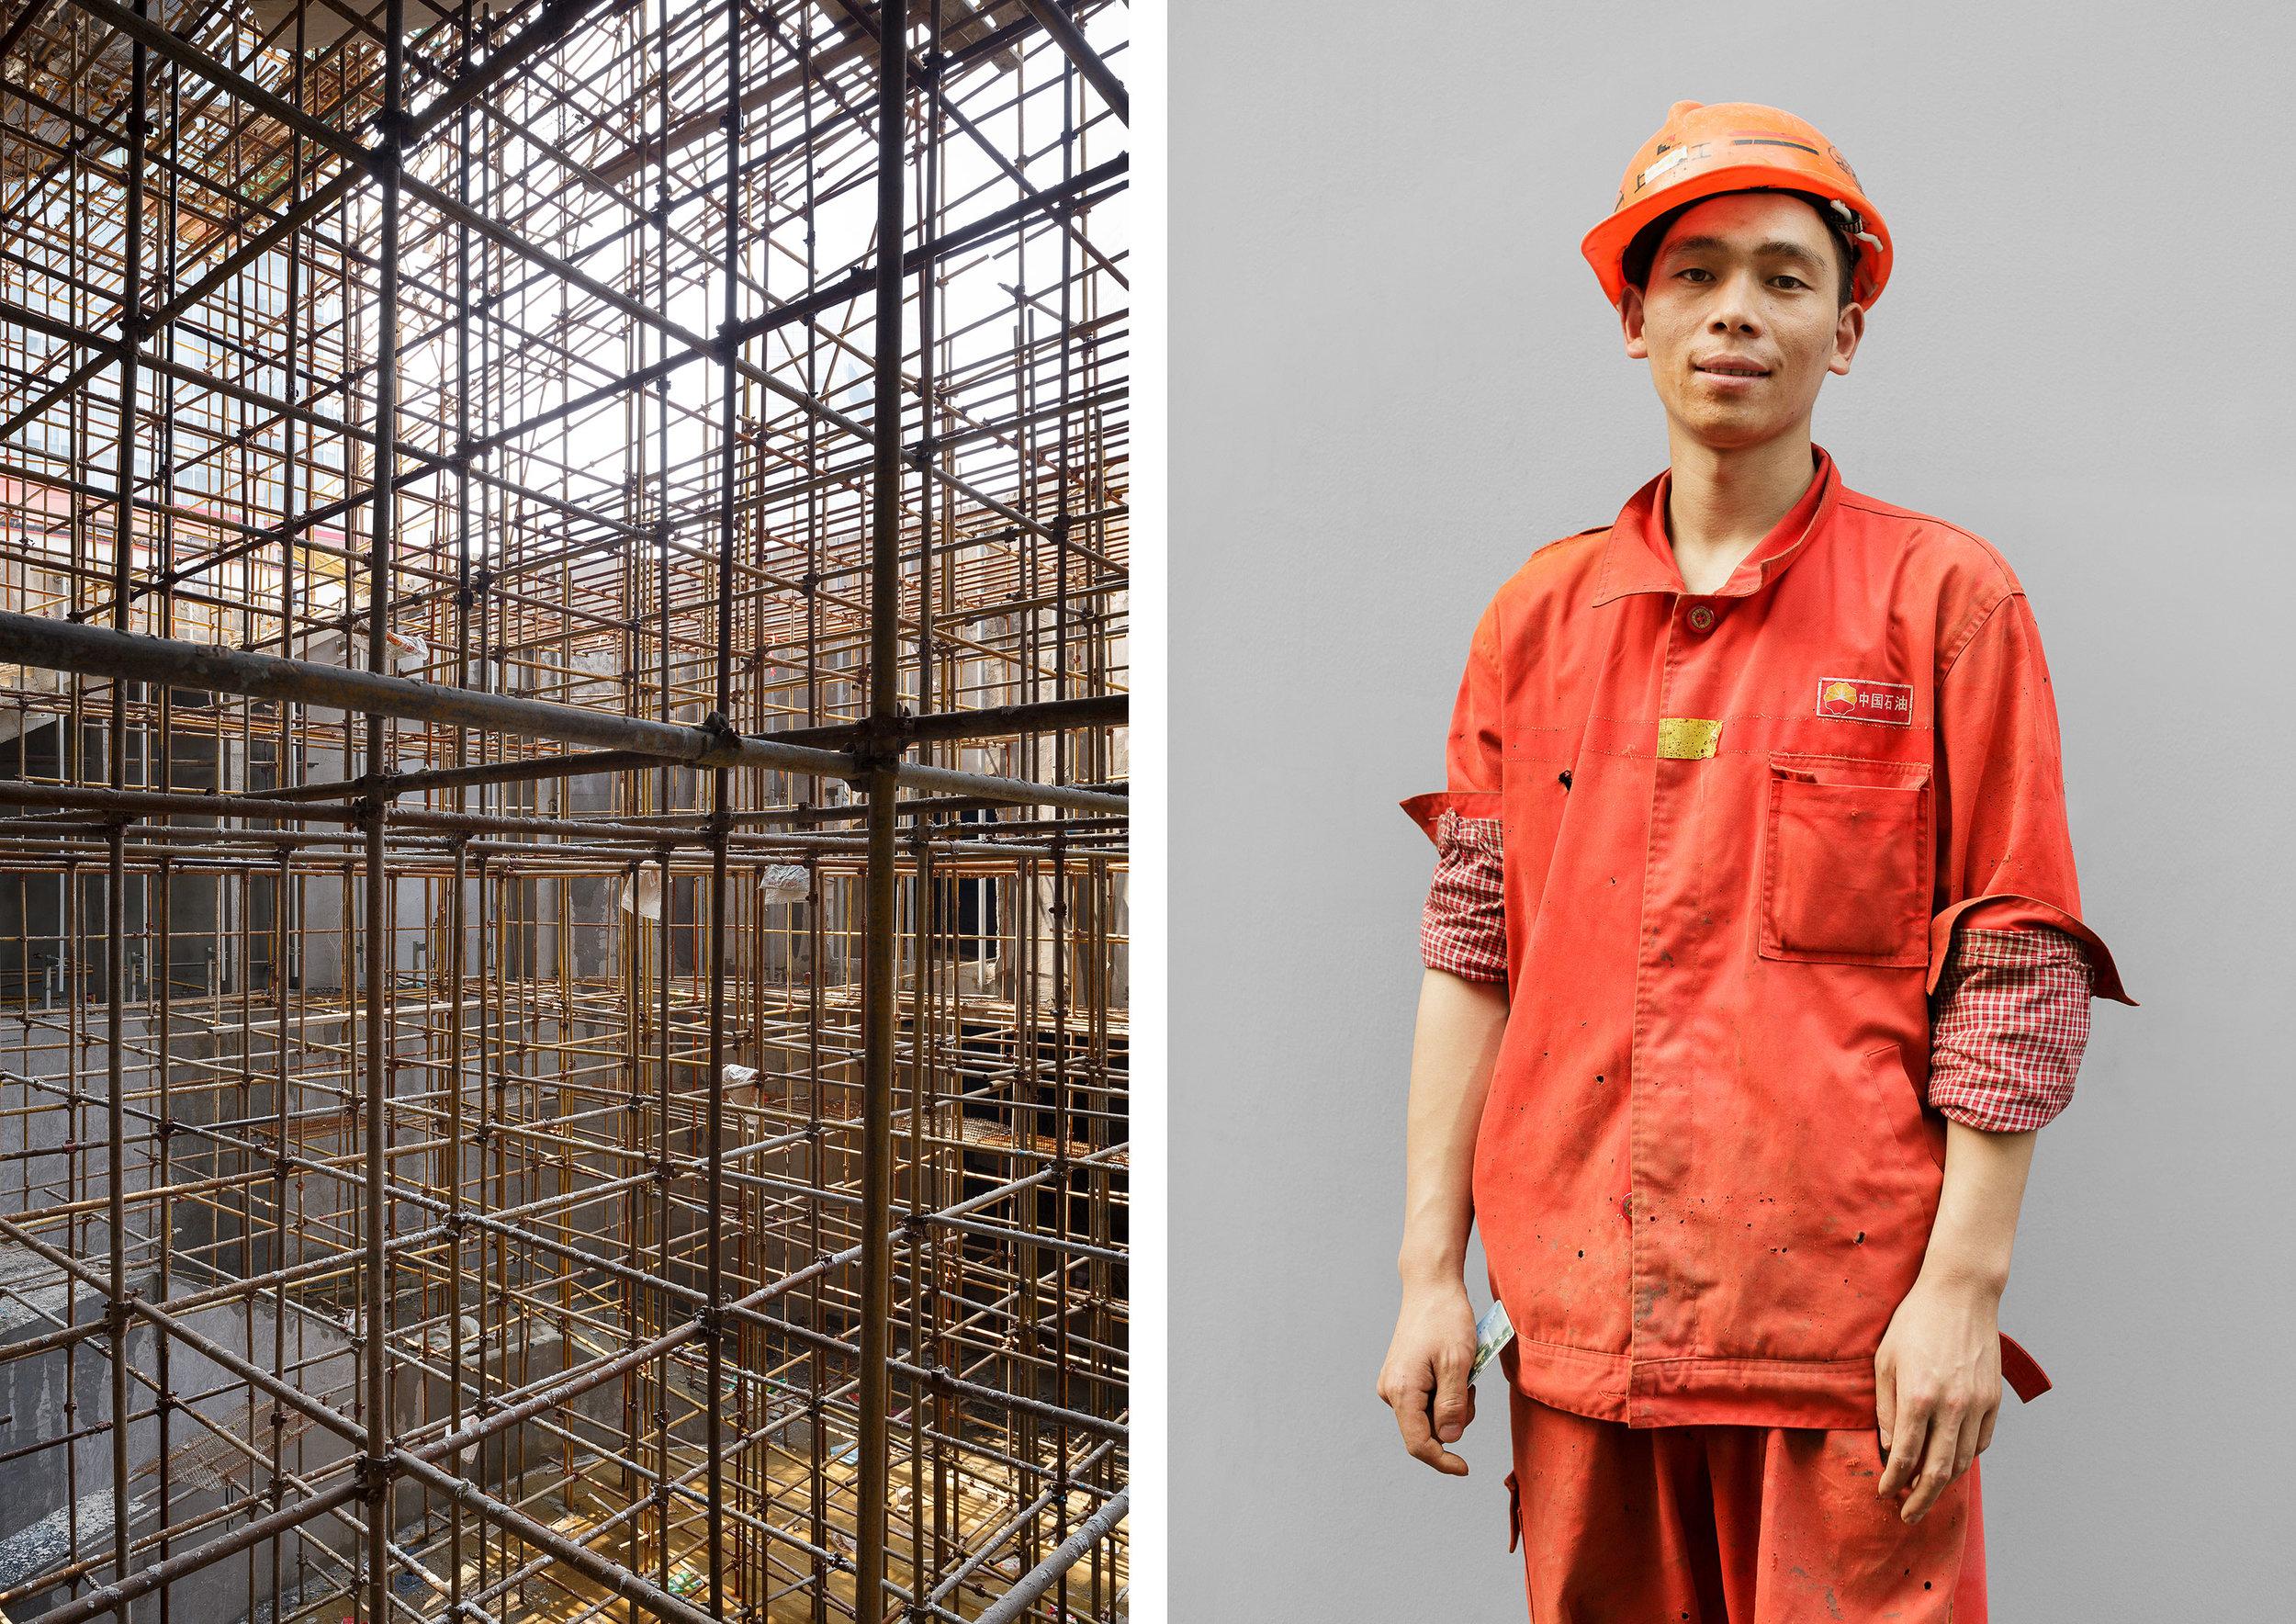 Shanghai_Tower-workers-and-building18.jpg